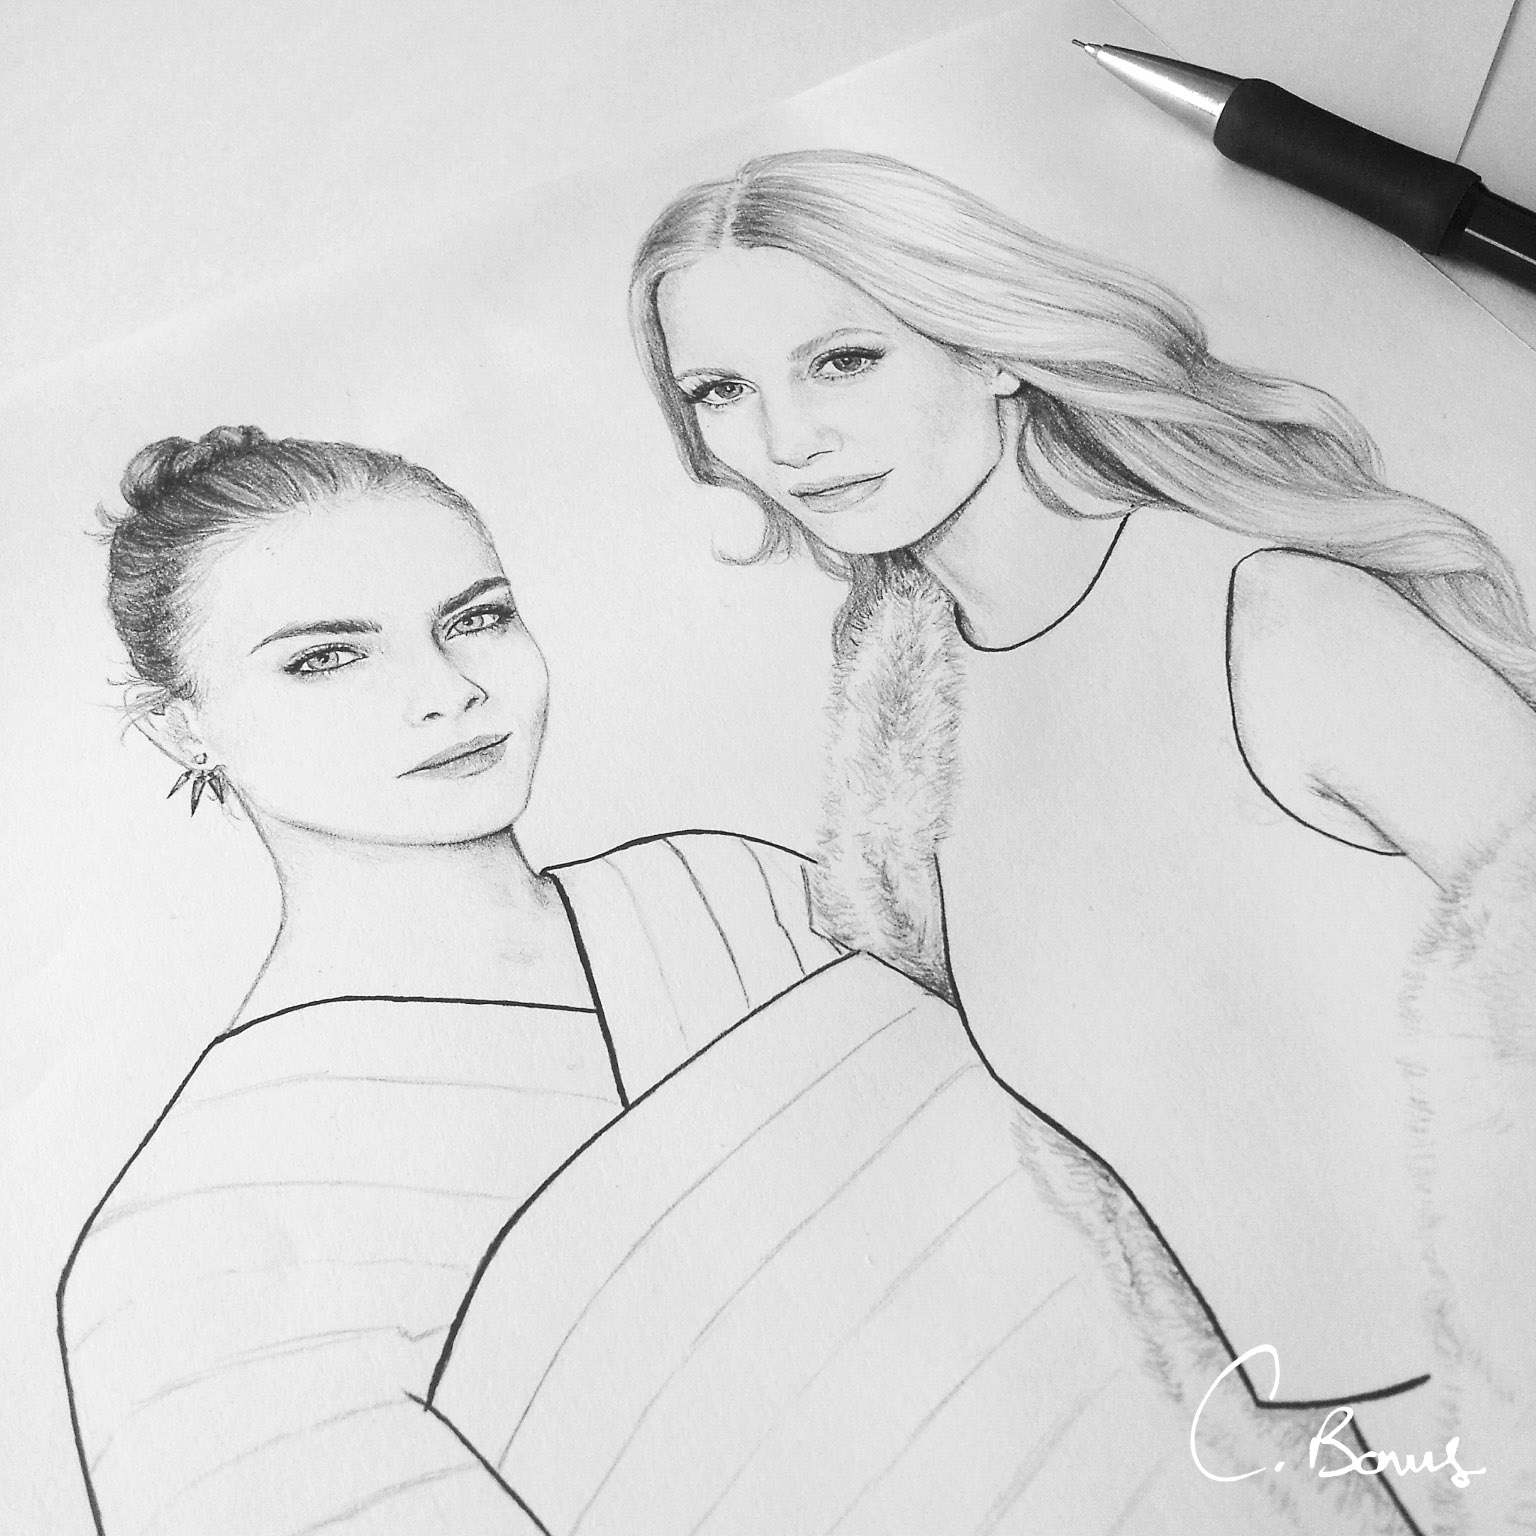 Cara and Poppy Delevingne, 2014